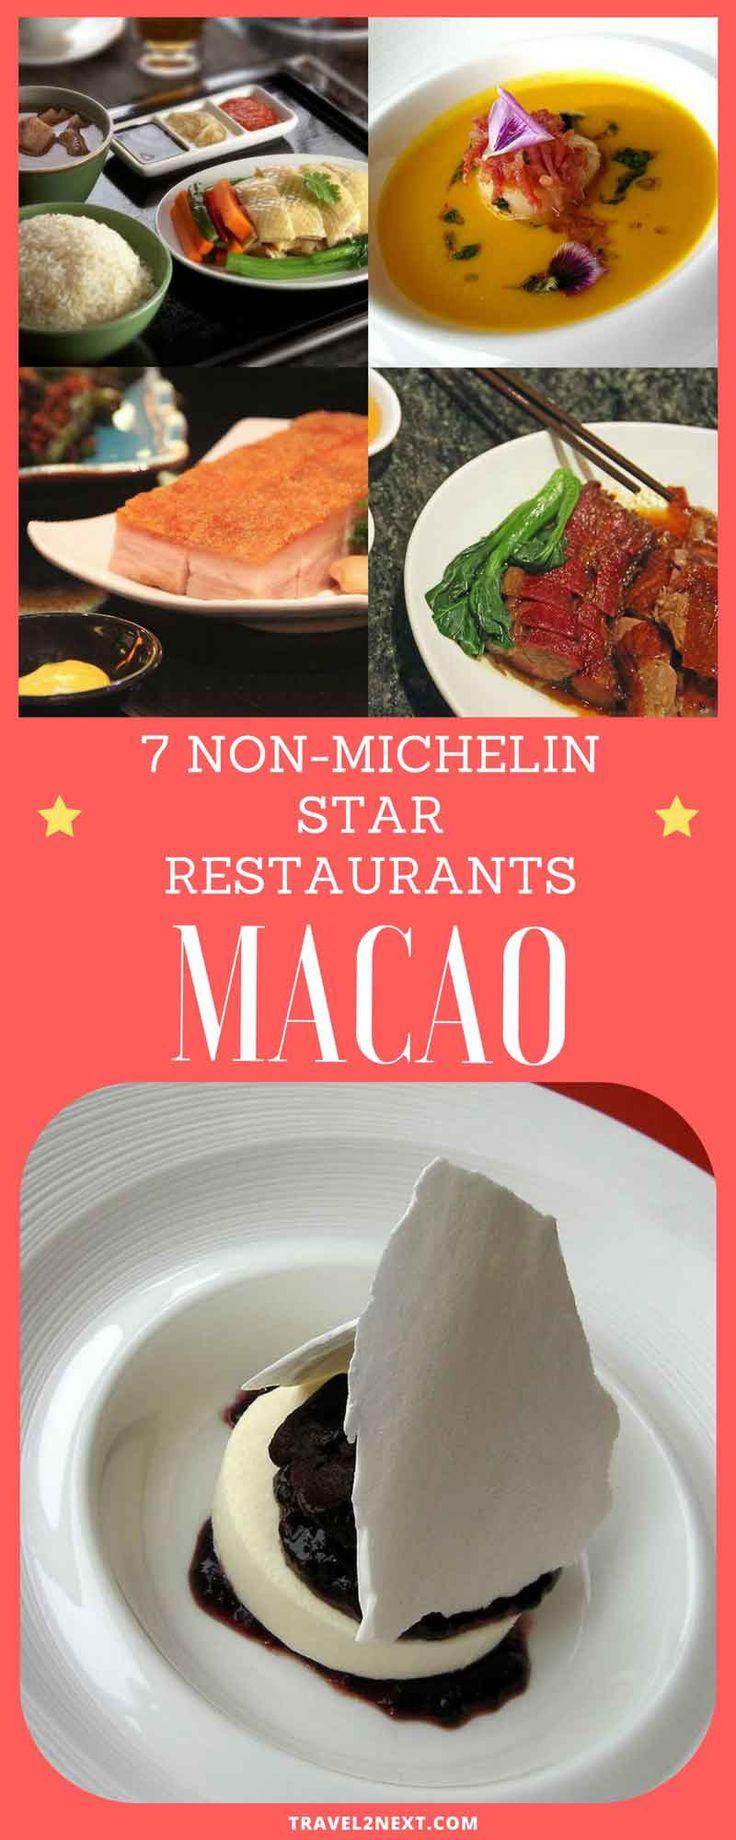 The Best Michelin Star Ideas On Pinterest Michelin Star Food - Top 10 expensive michelin starred restaurants world